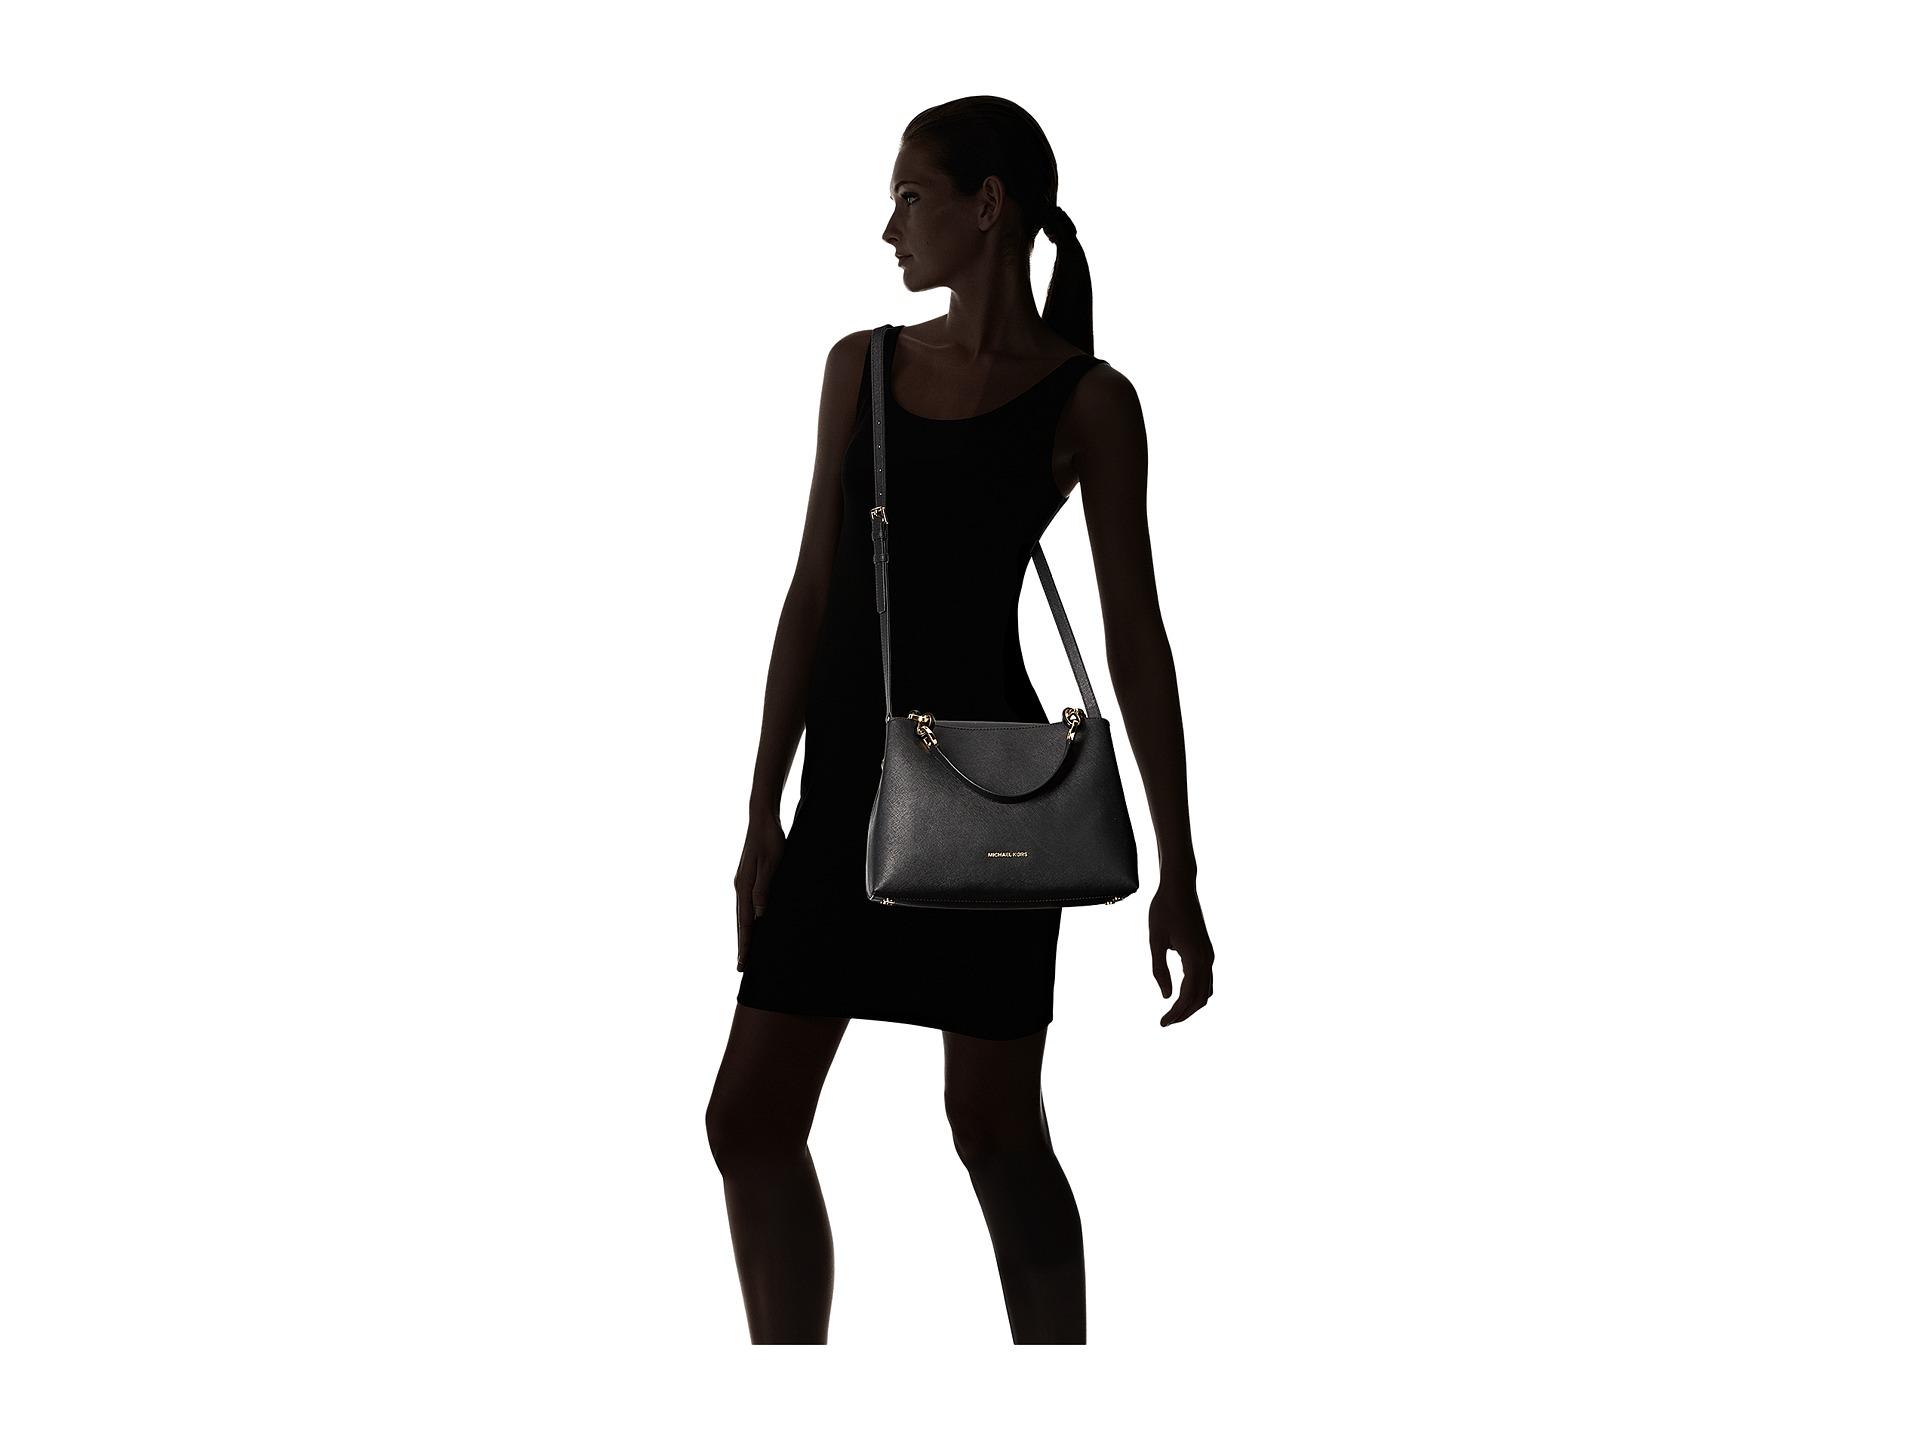 ... Sale \u2013 Cyber Monday Deals Specials. michael kors portia large saffiano leather shoulder bag